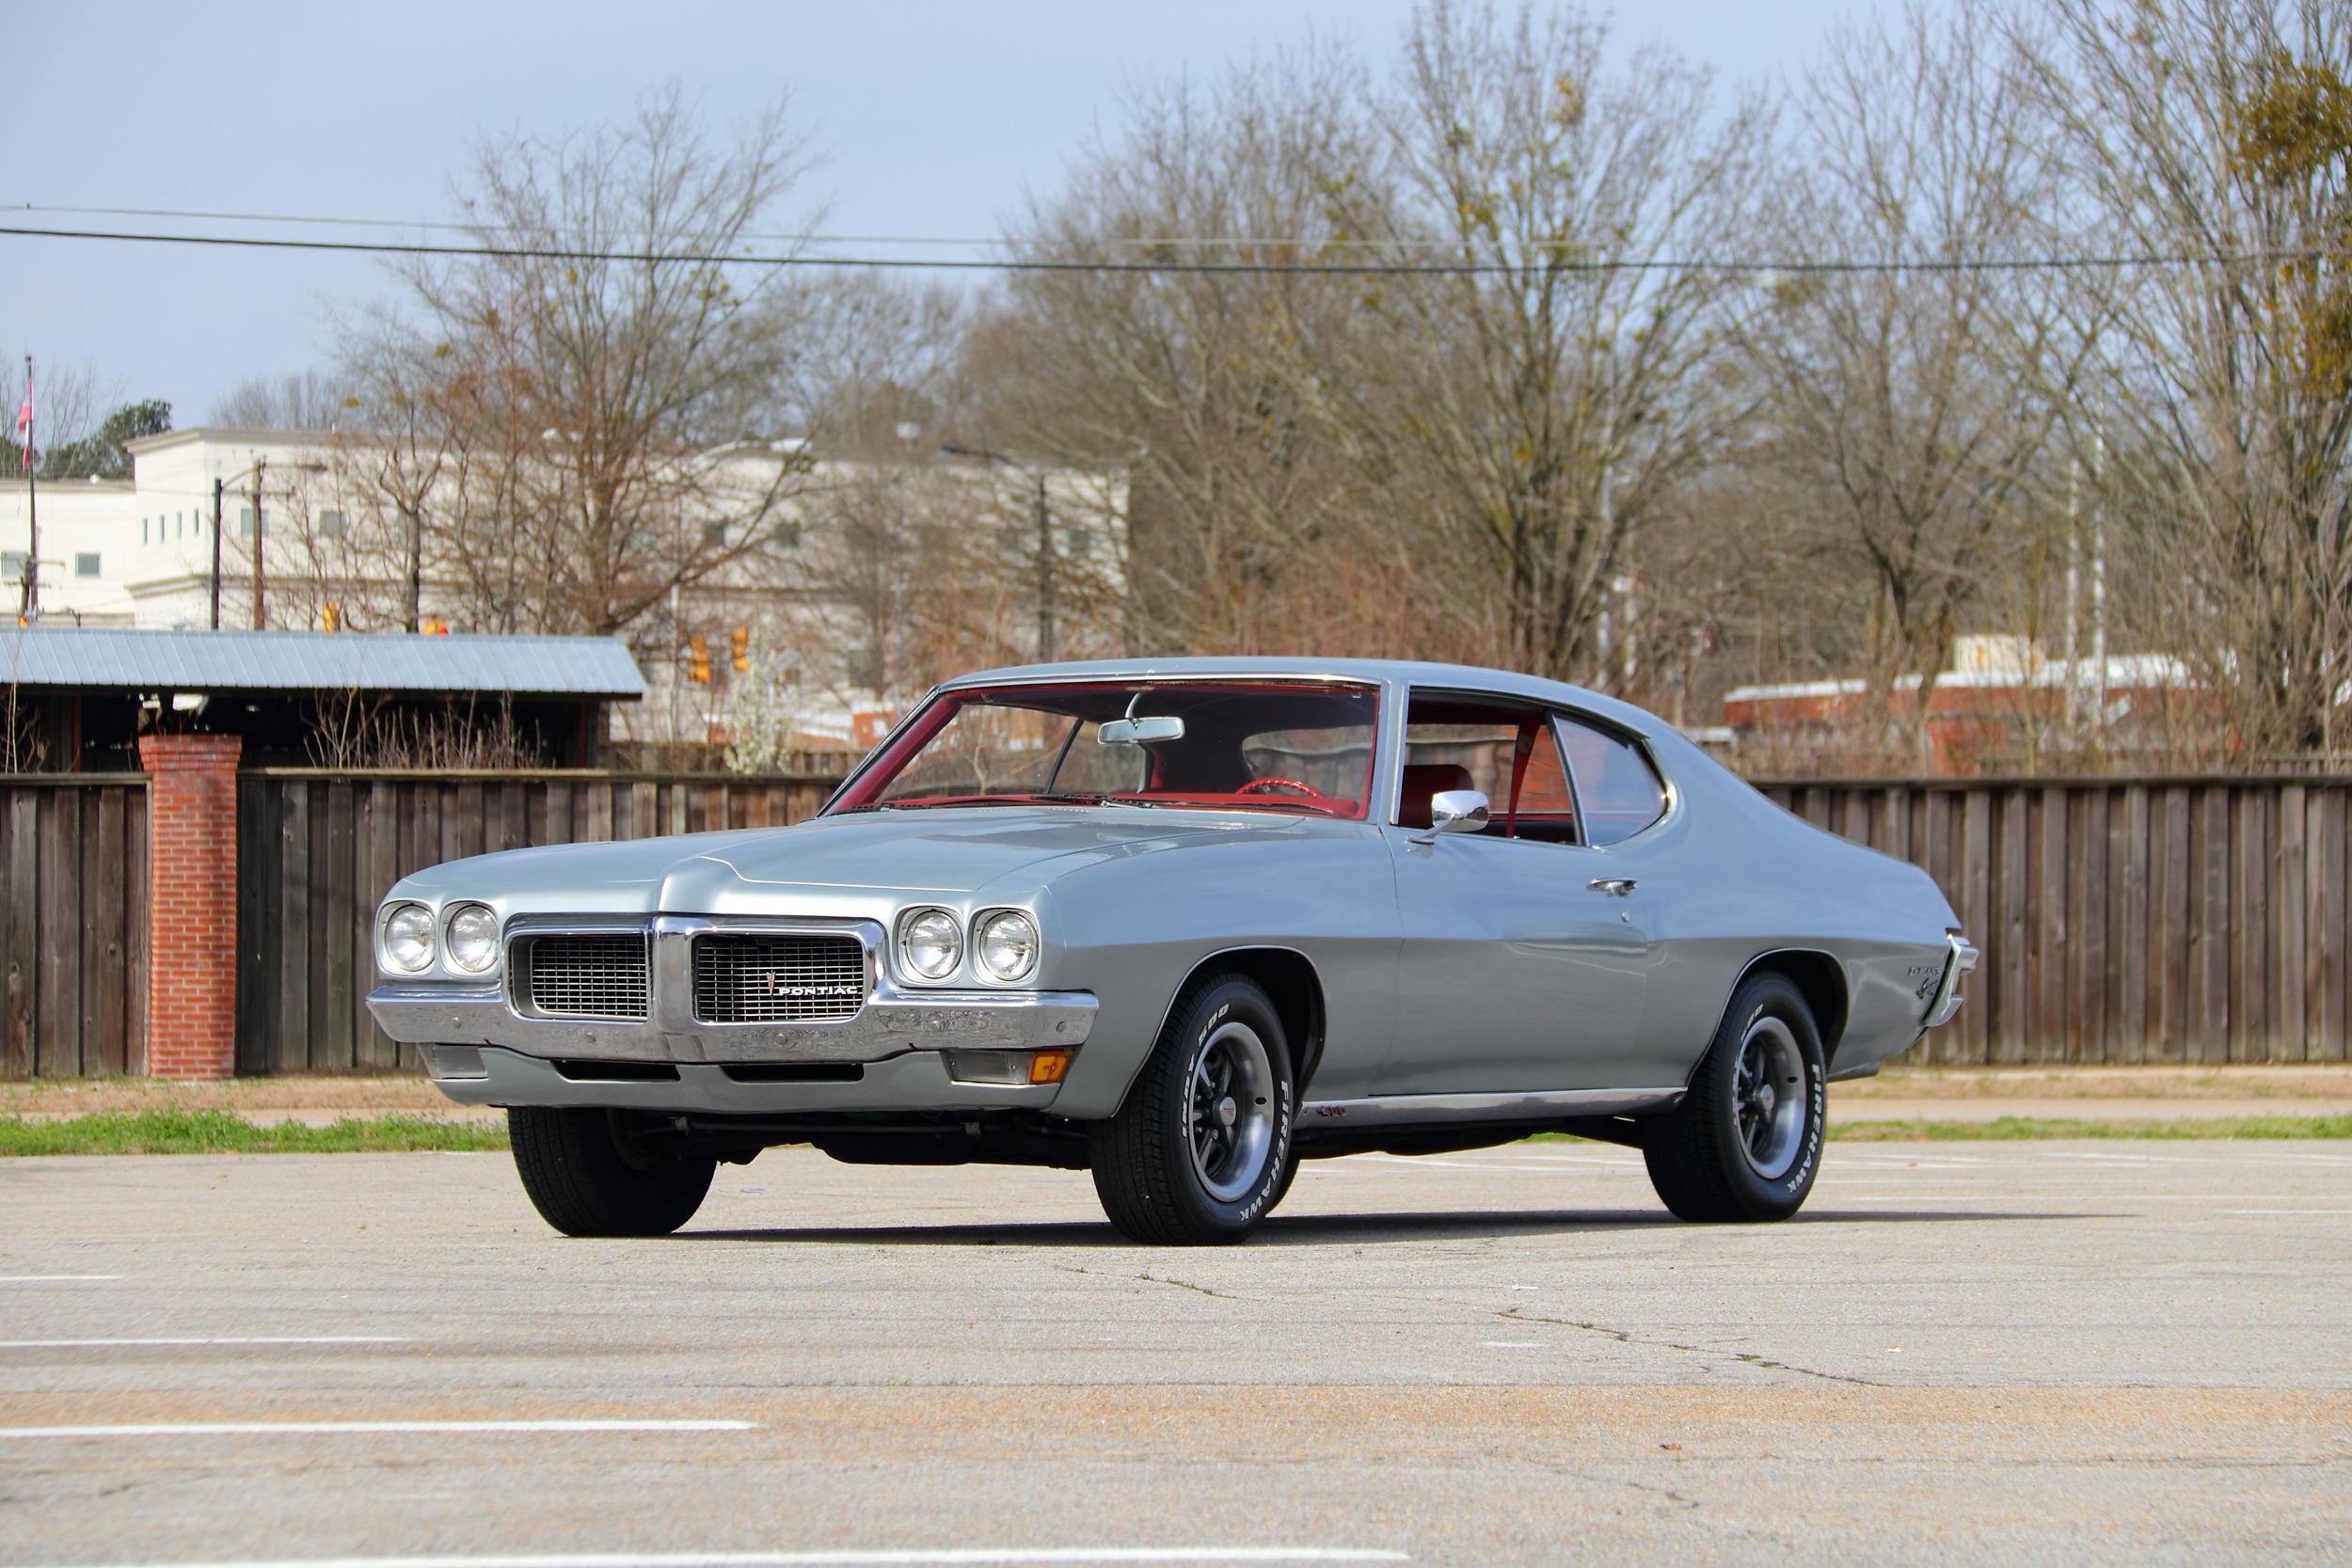 1970 Pontiac Lemans Sport 400 CI 4-Speed (Lot F218) - Mecum Auctions Houston